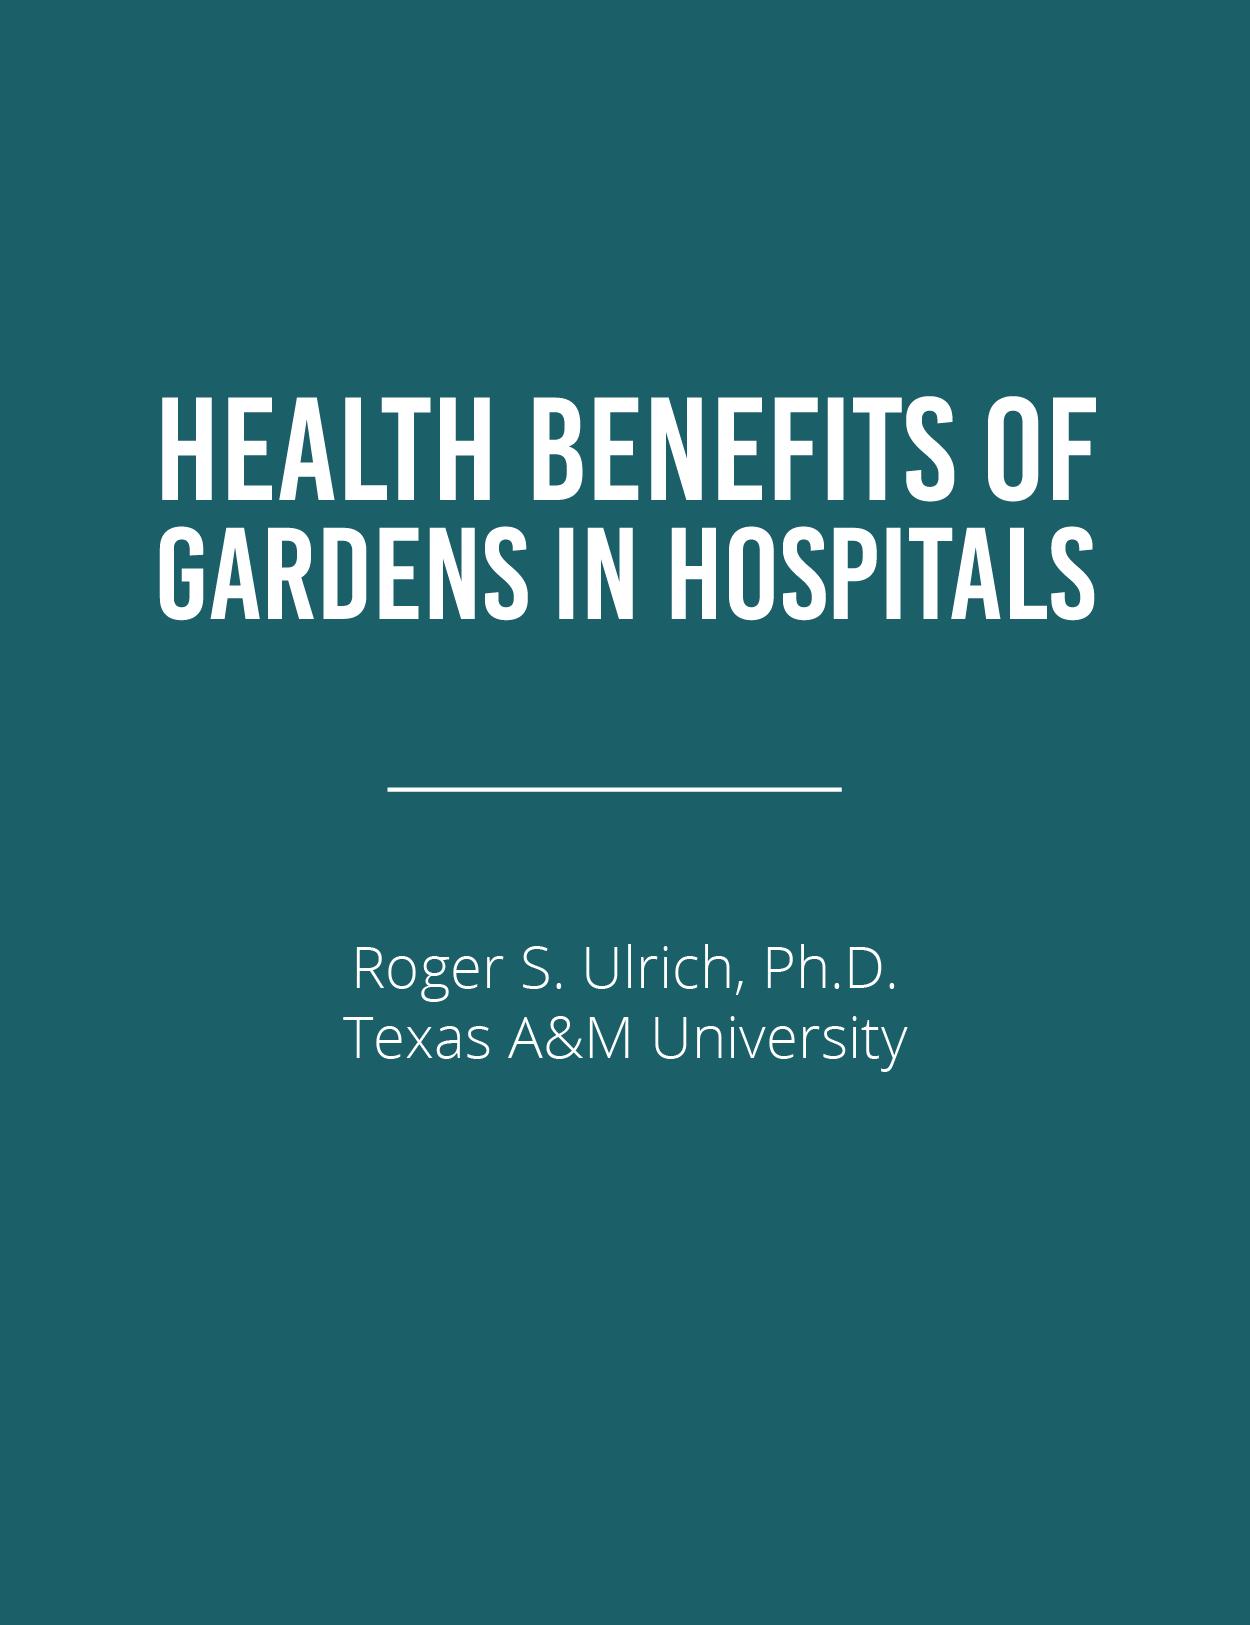 Health Benefits of Gardens in Hospitals